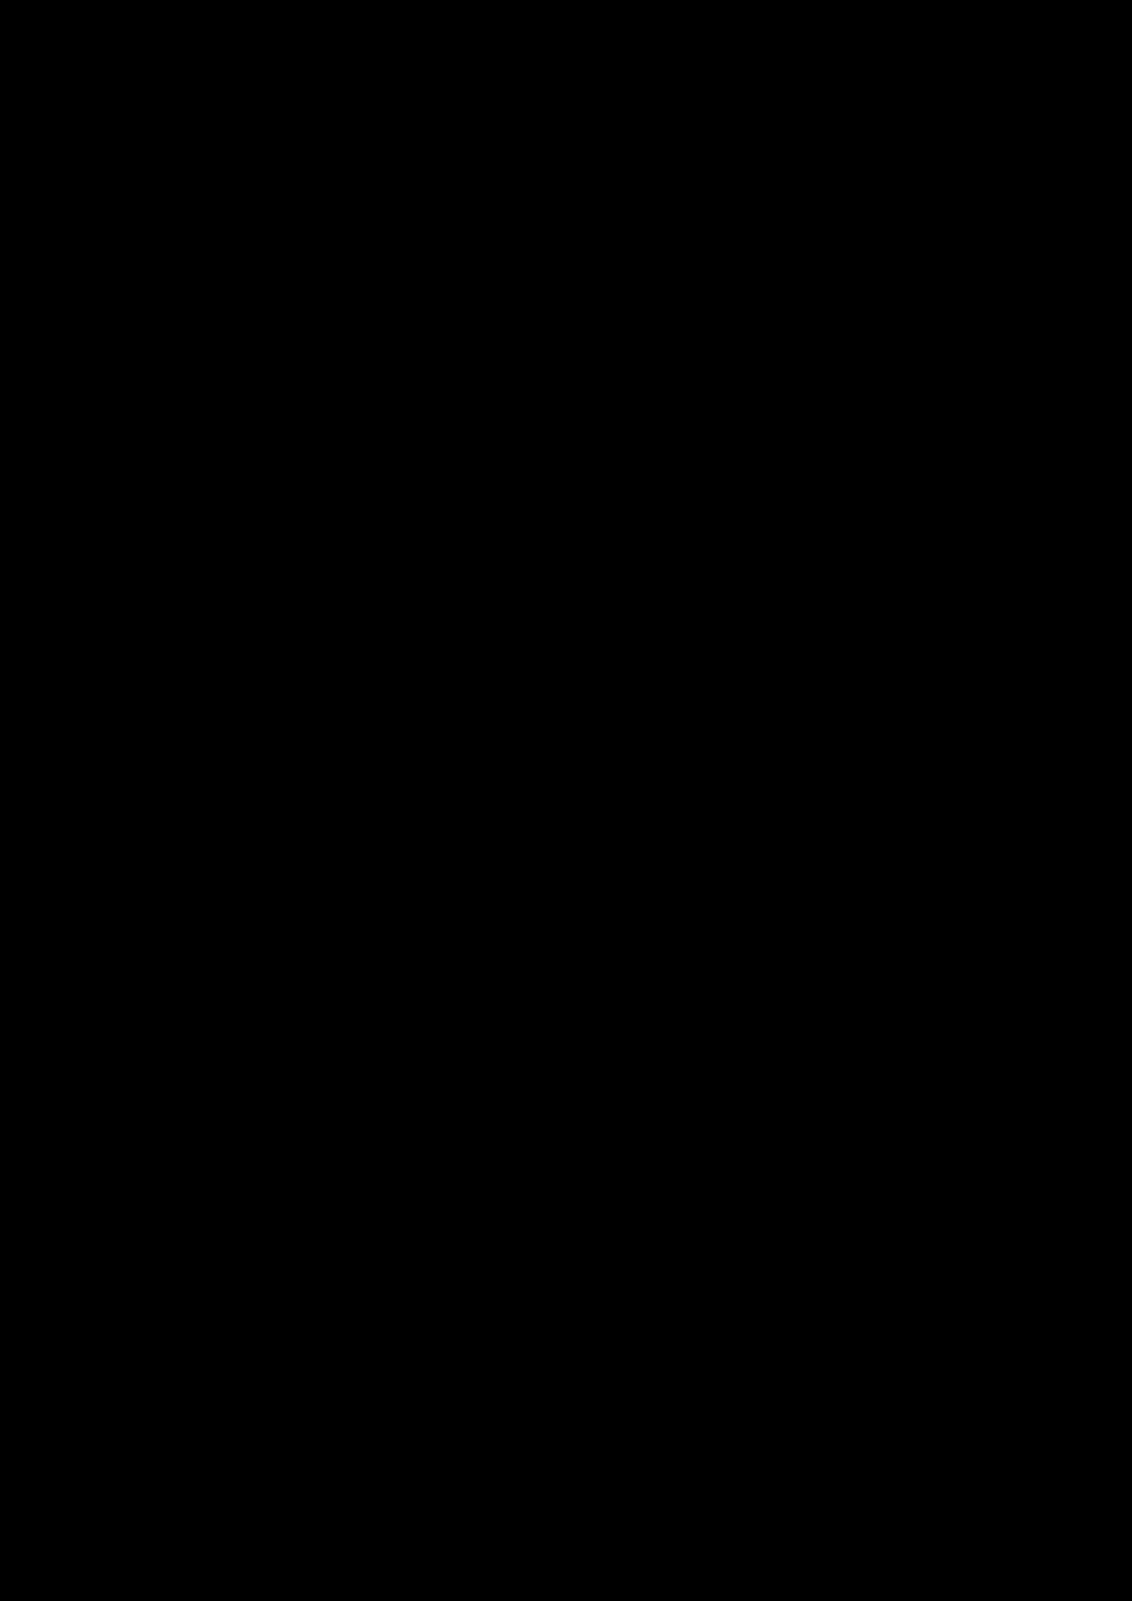 Prosti slide, Image 8